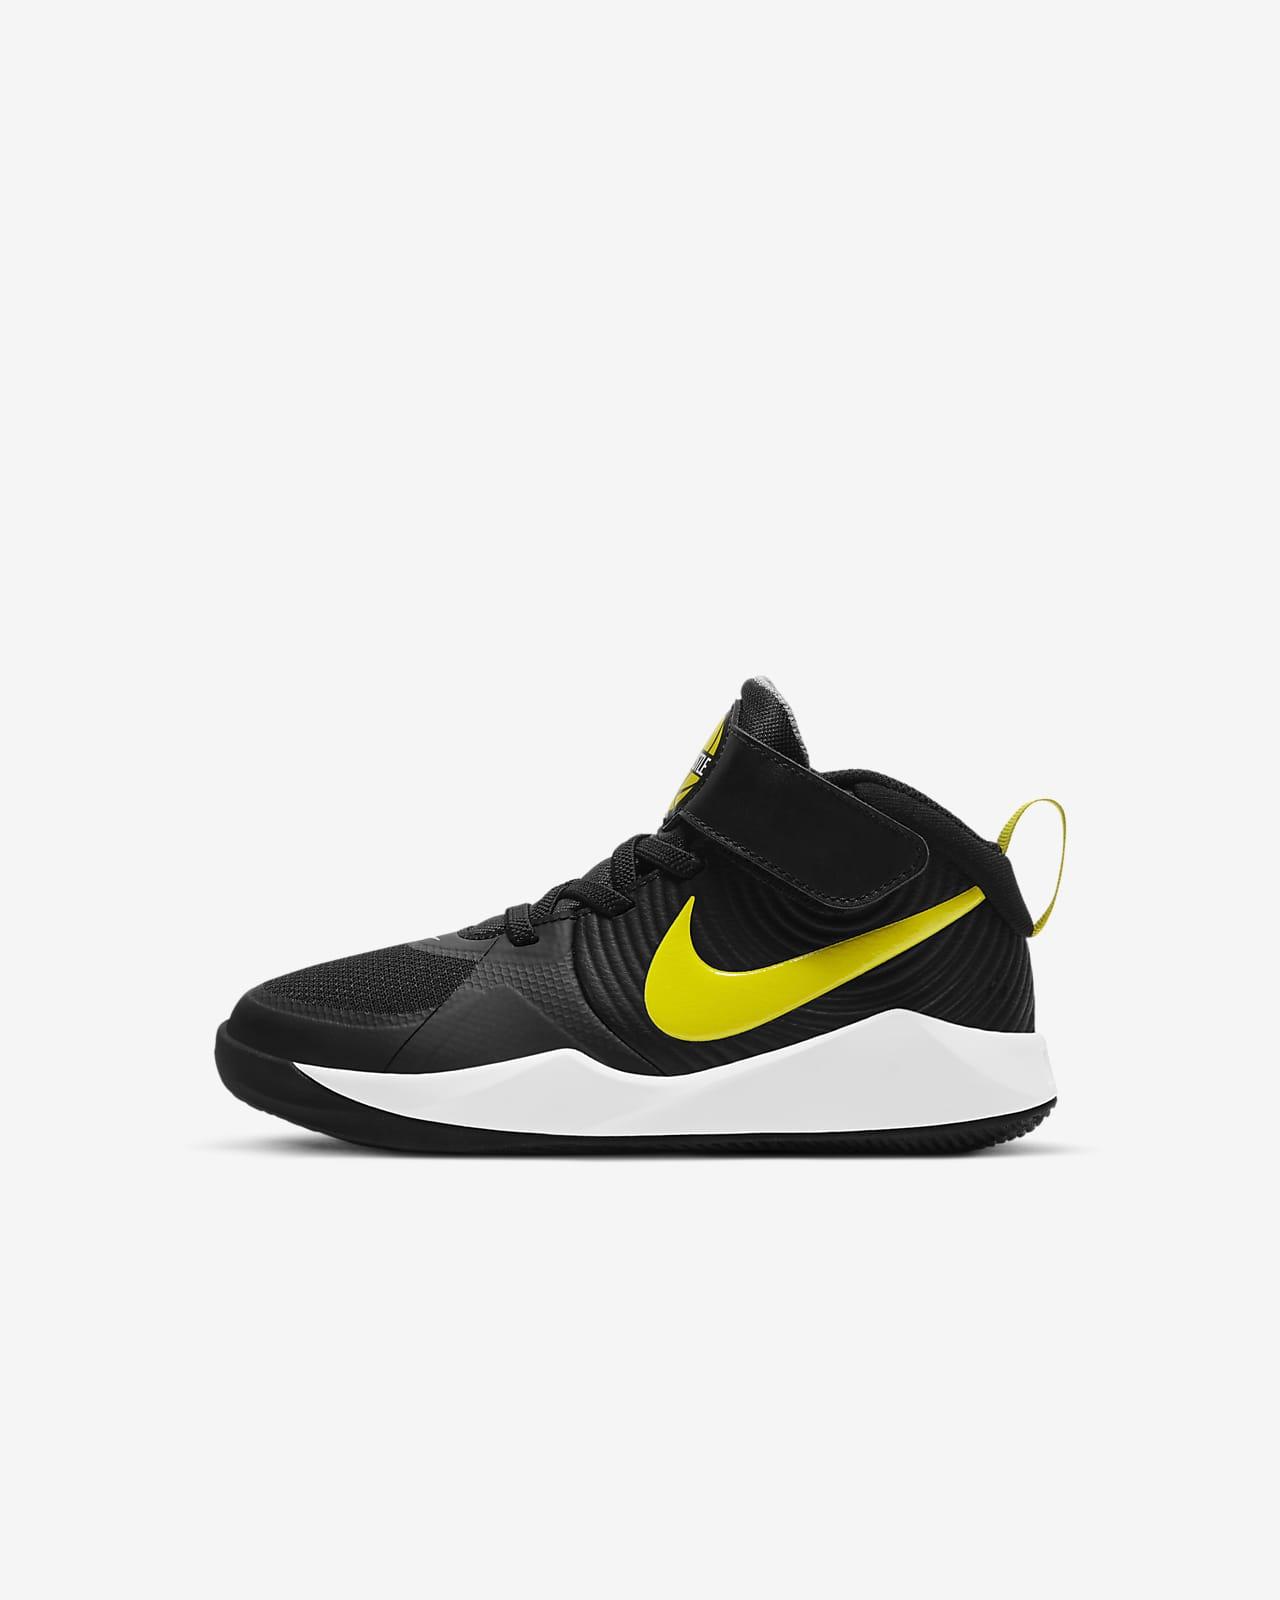 Nike Team Hustle D 9 Little Kids' Shoes